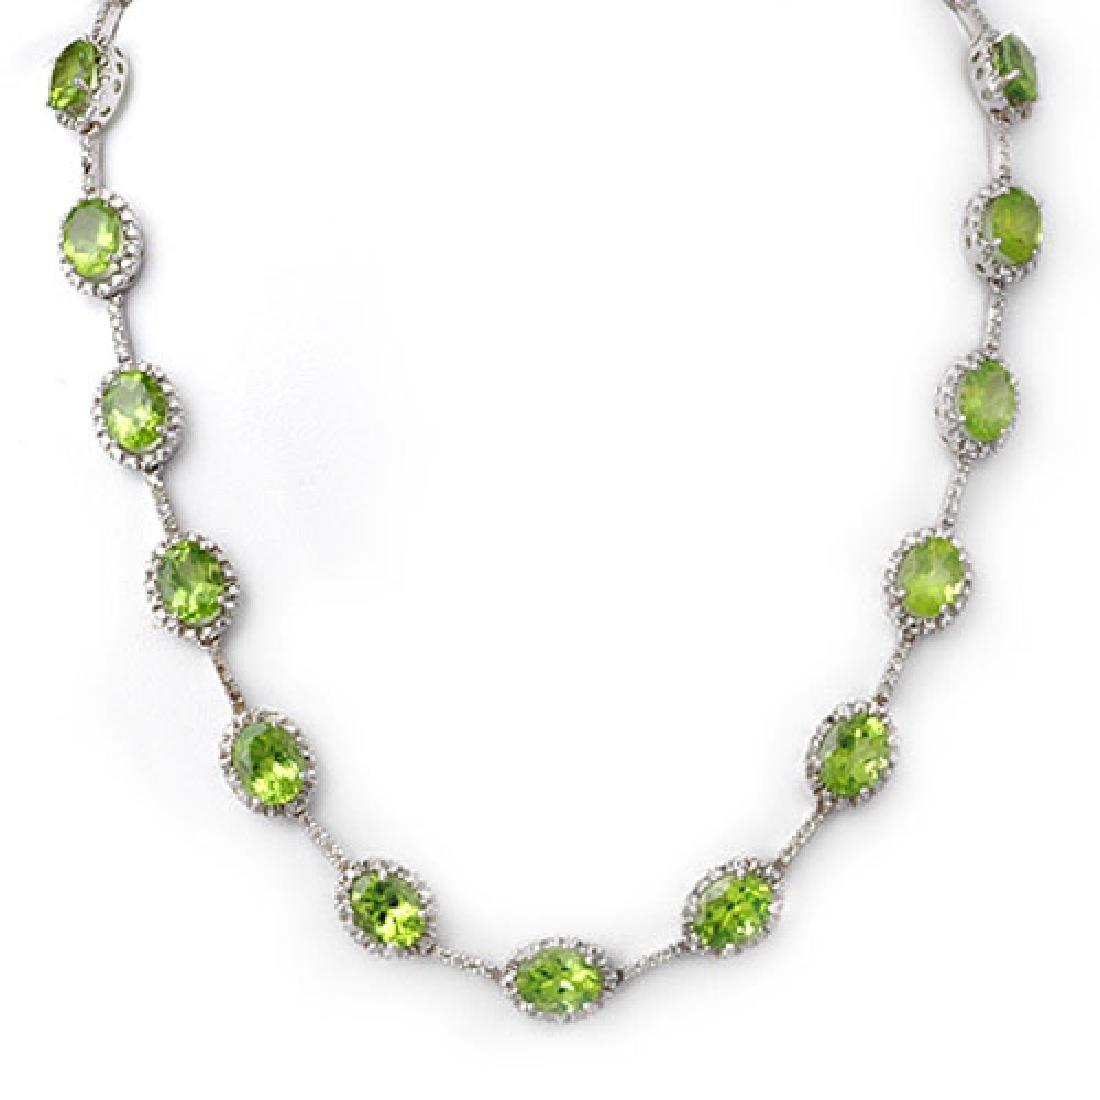 45.0 CTW Peridot & Diamond Necklace 10K White Gold